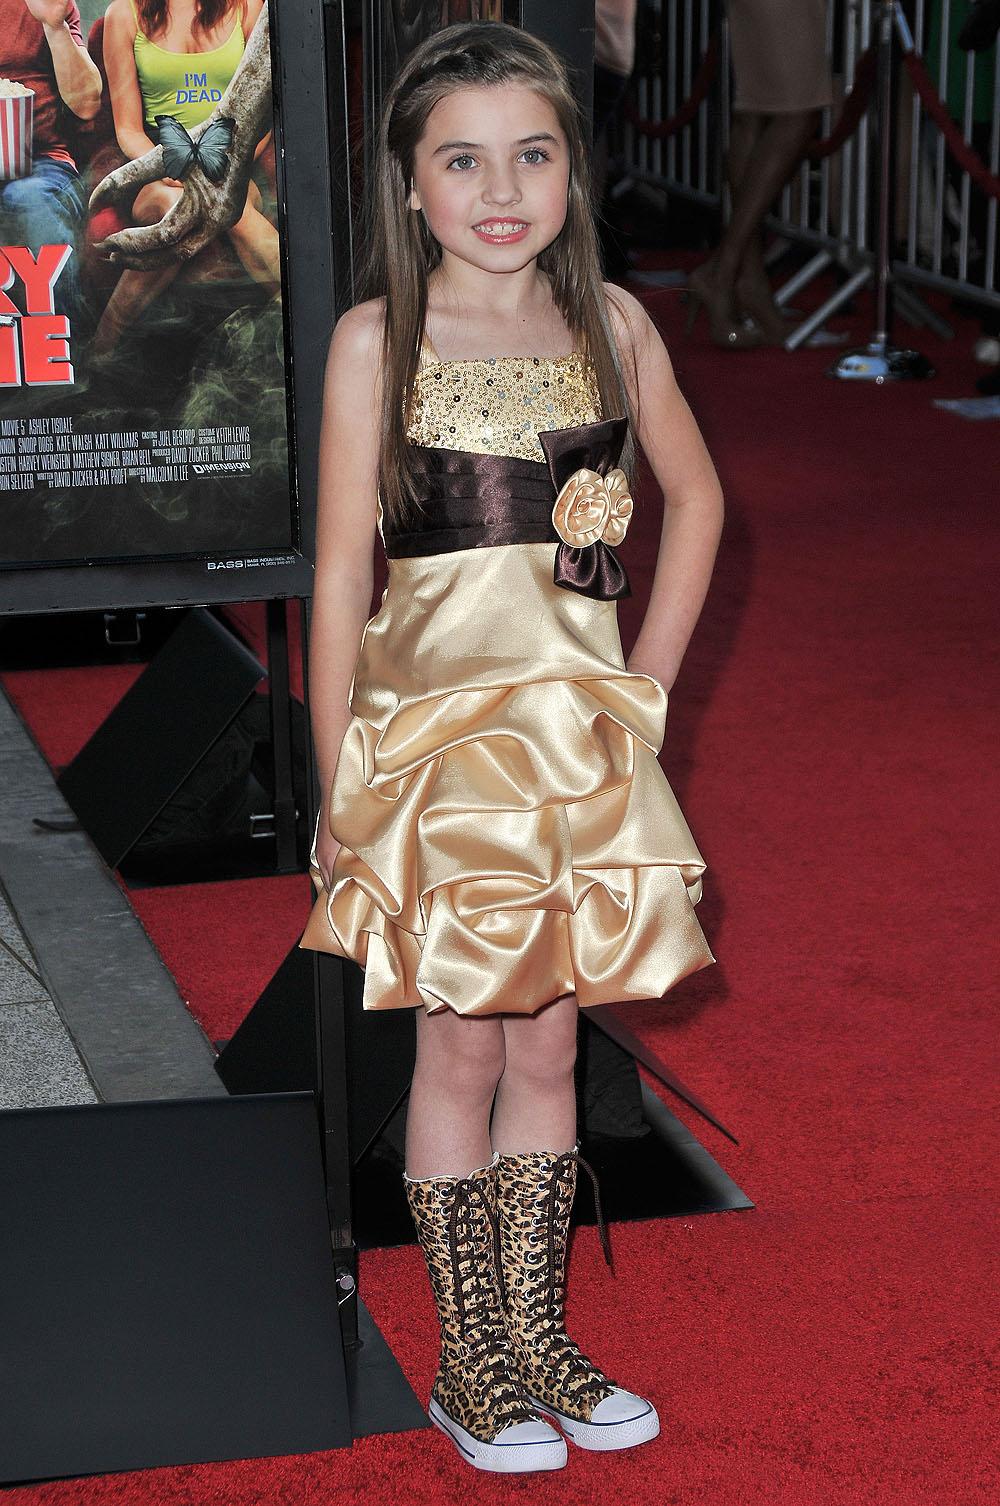 Erica ash scary movie 5 - 3 2